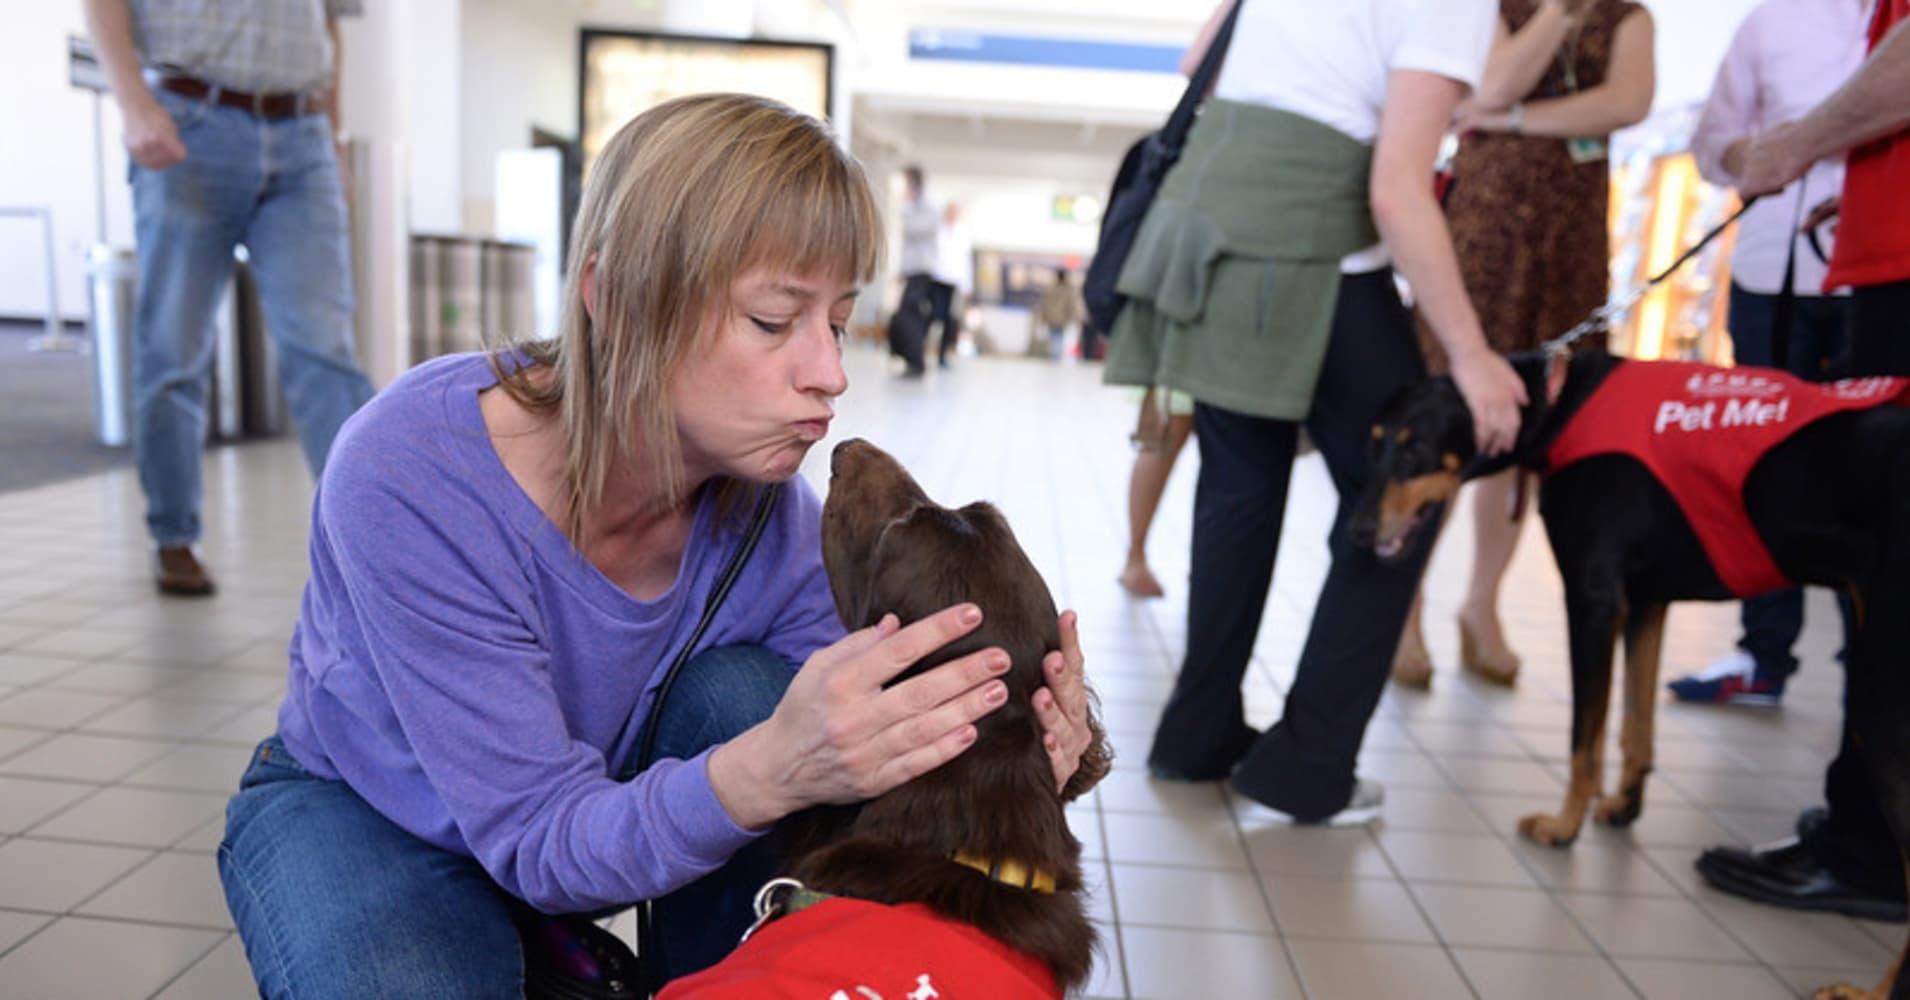 Now Arriving: Cuddly Volunteers to Help De-Stress LAX Fliers